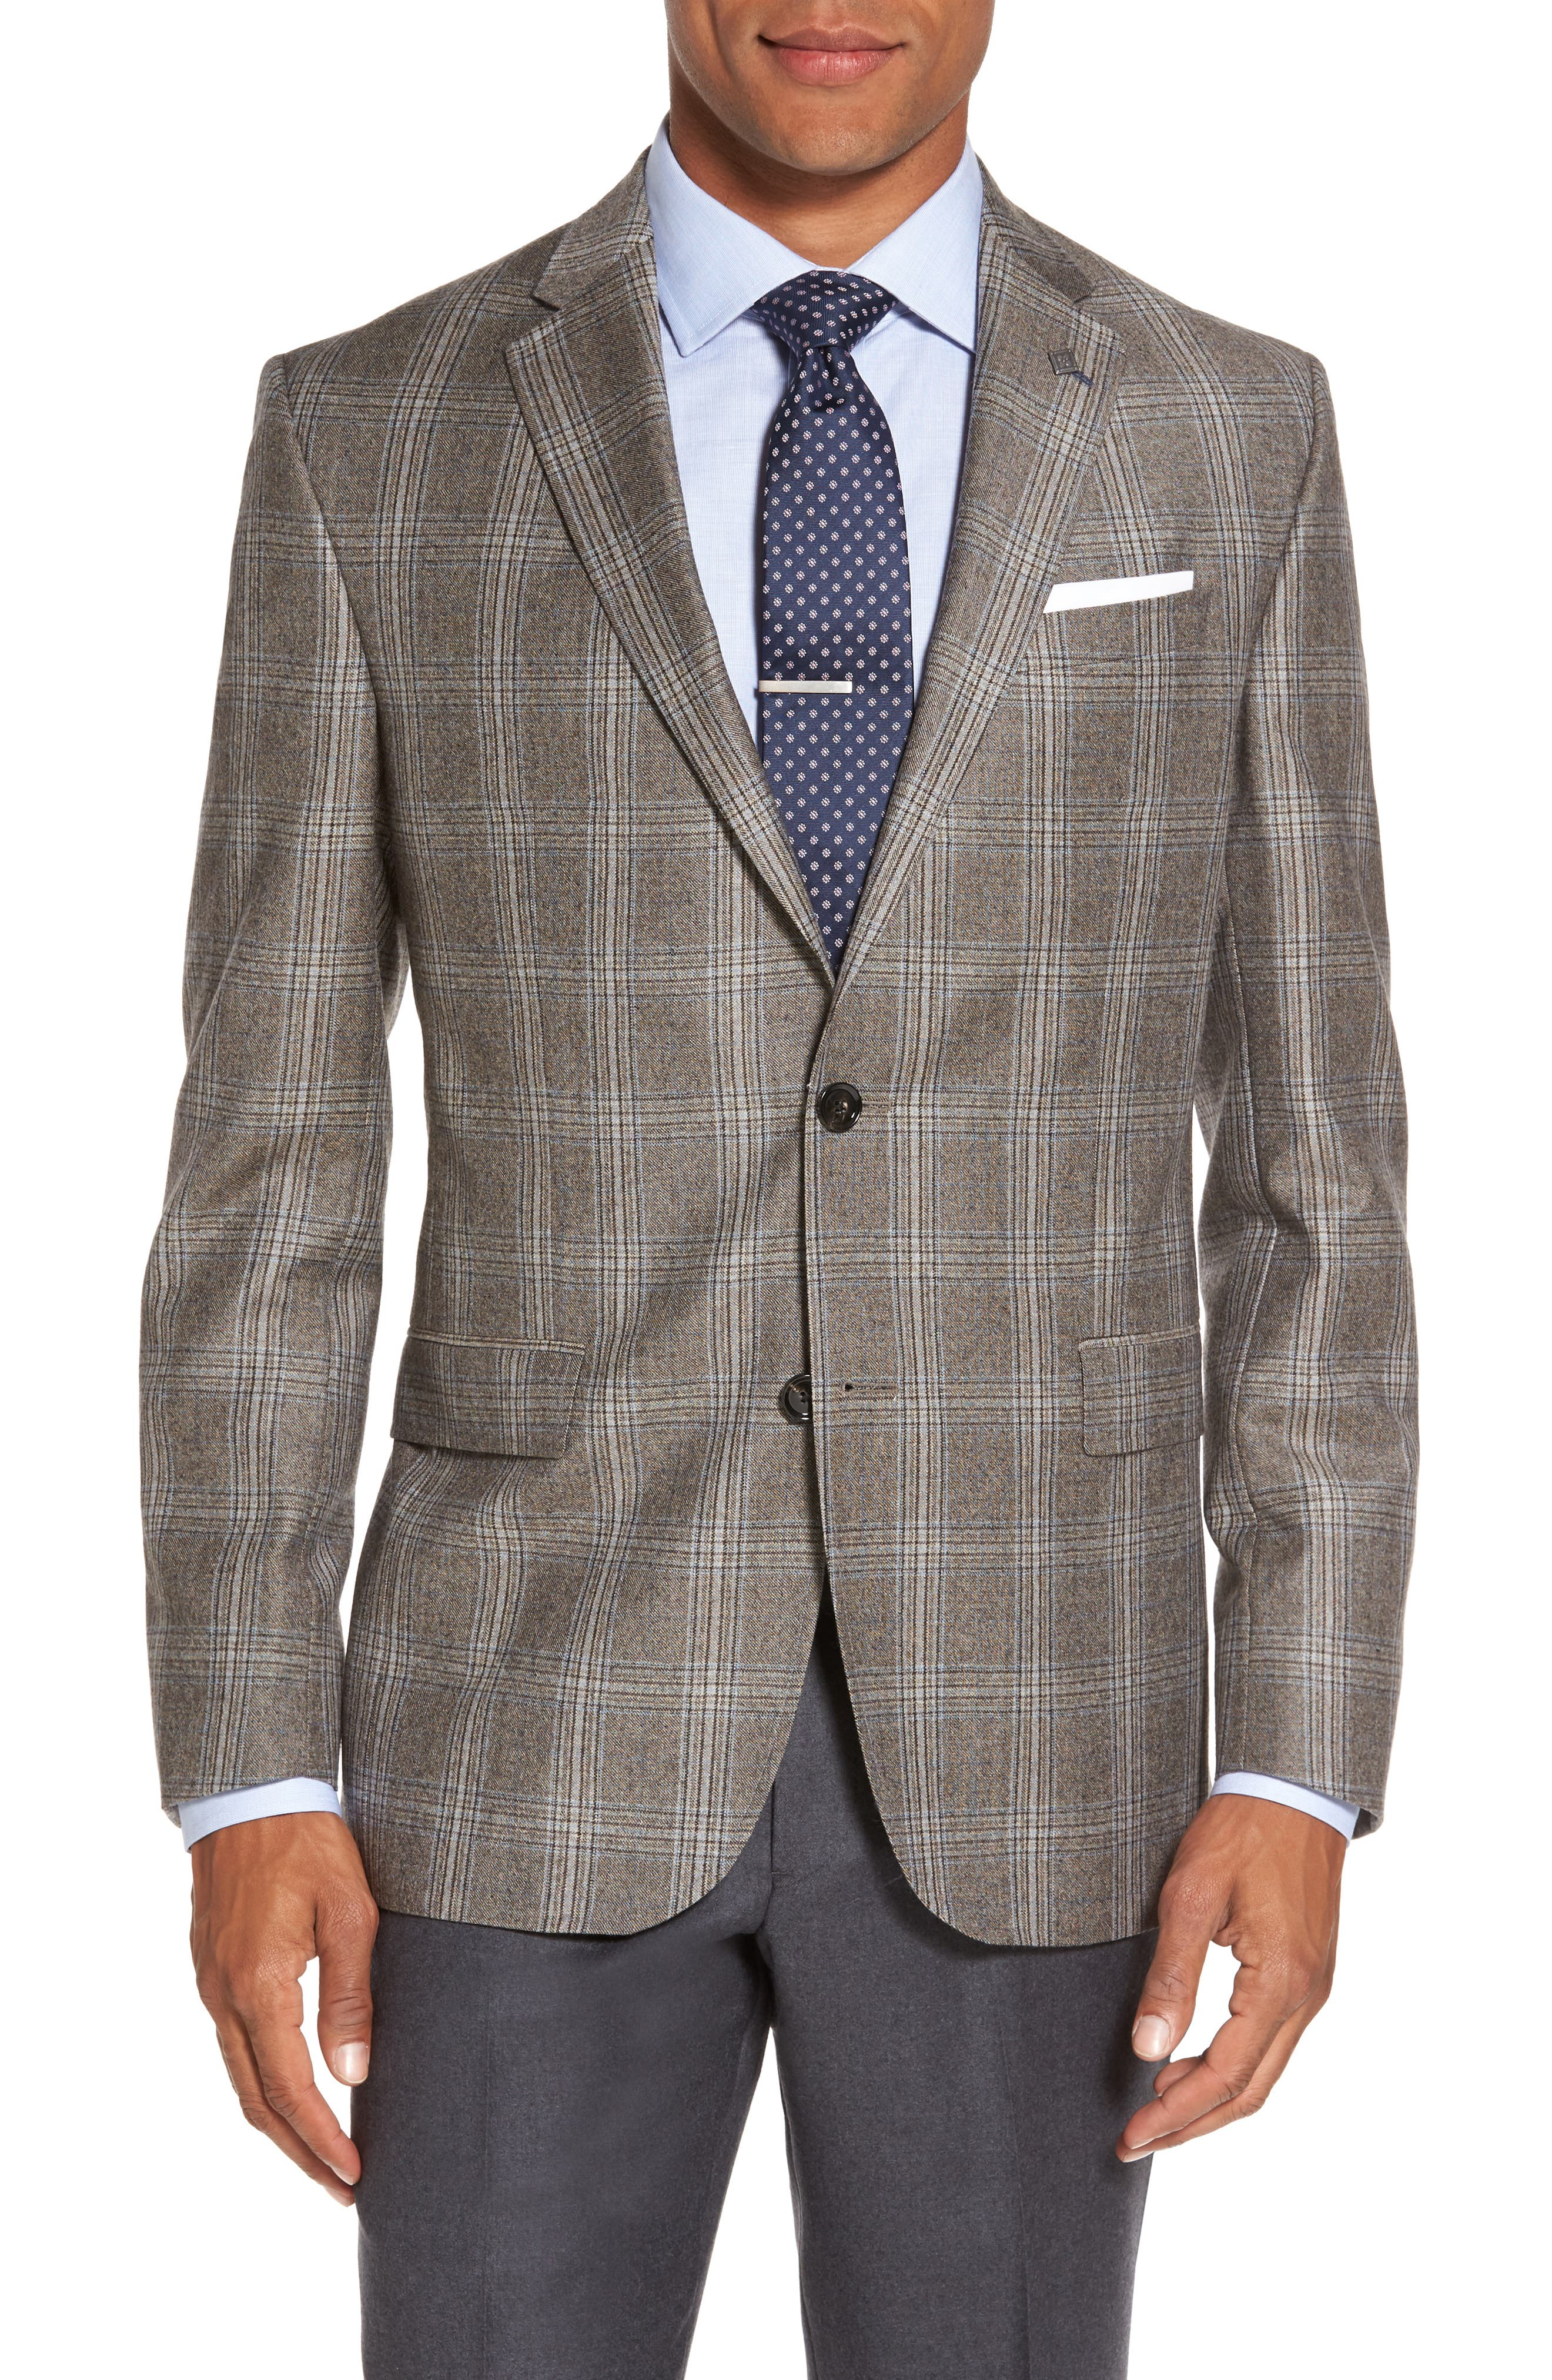 Jay Trim Fit Plaid Wool Sport Coat,                             Main thumbnail 1, color,                             230